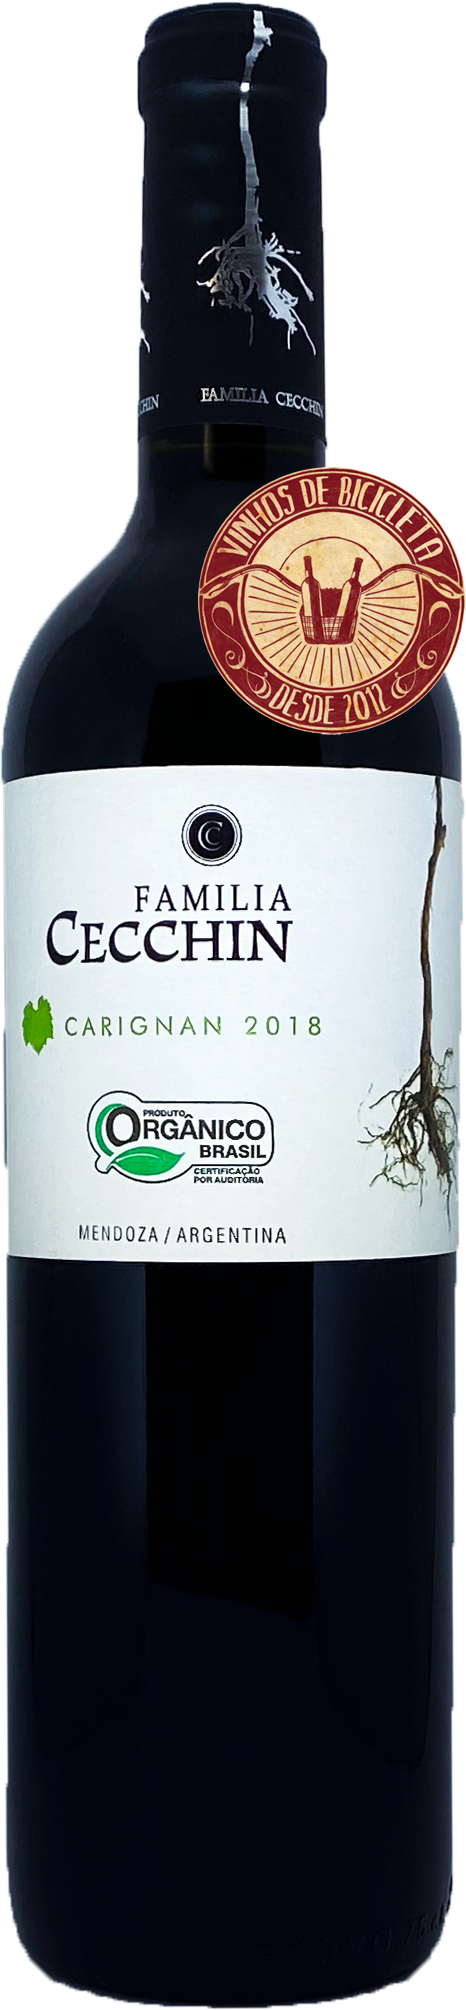 Família Cecchin Carignan (Orgânico)